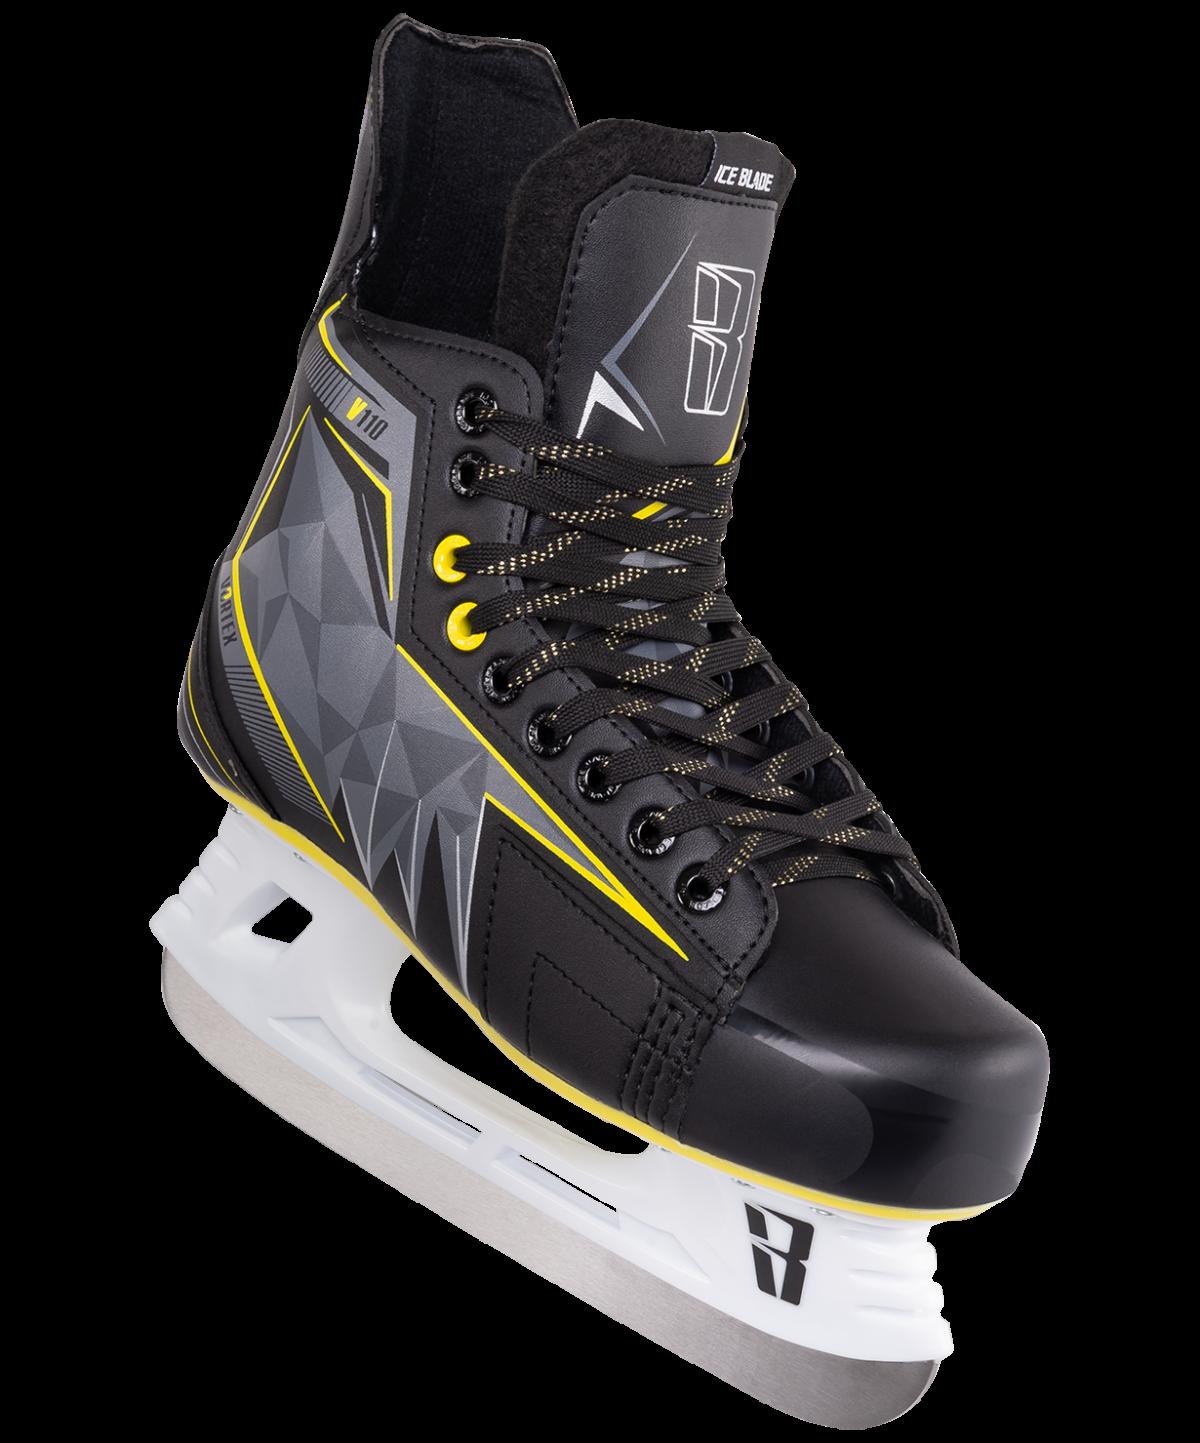 ICE BLADE Коньки хоккейные Vortex V110 - 5